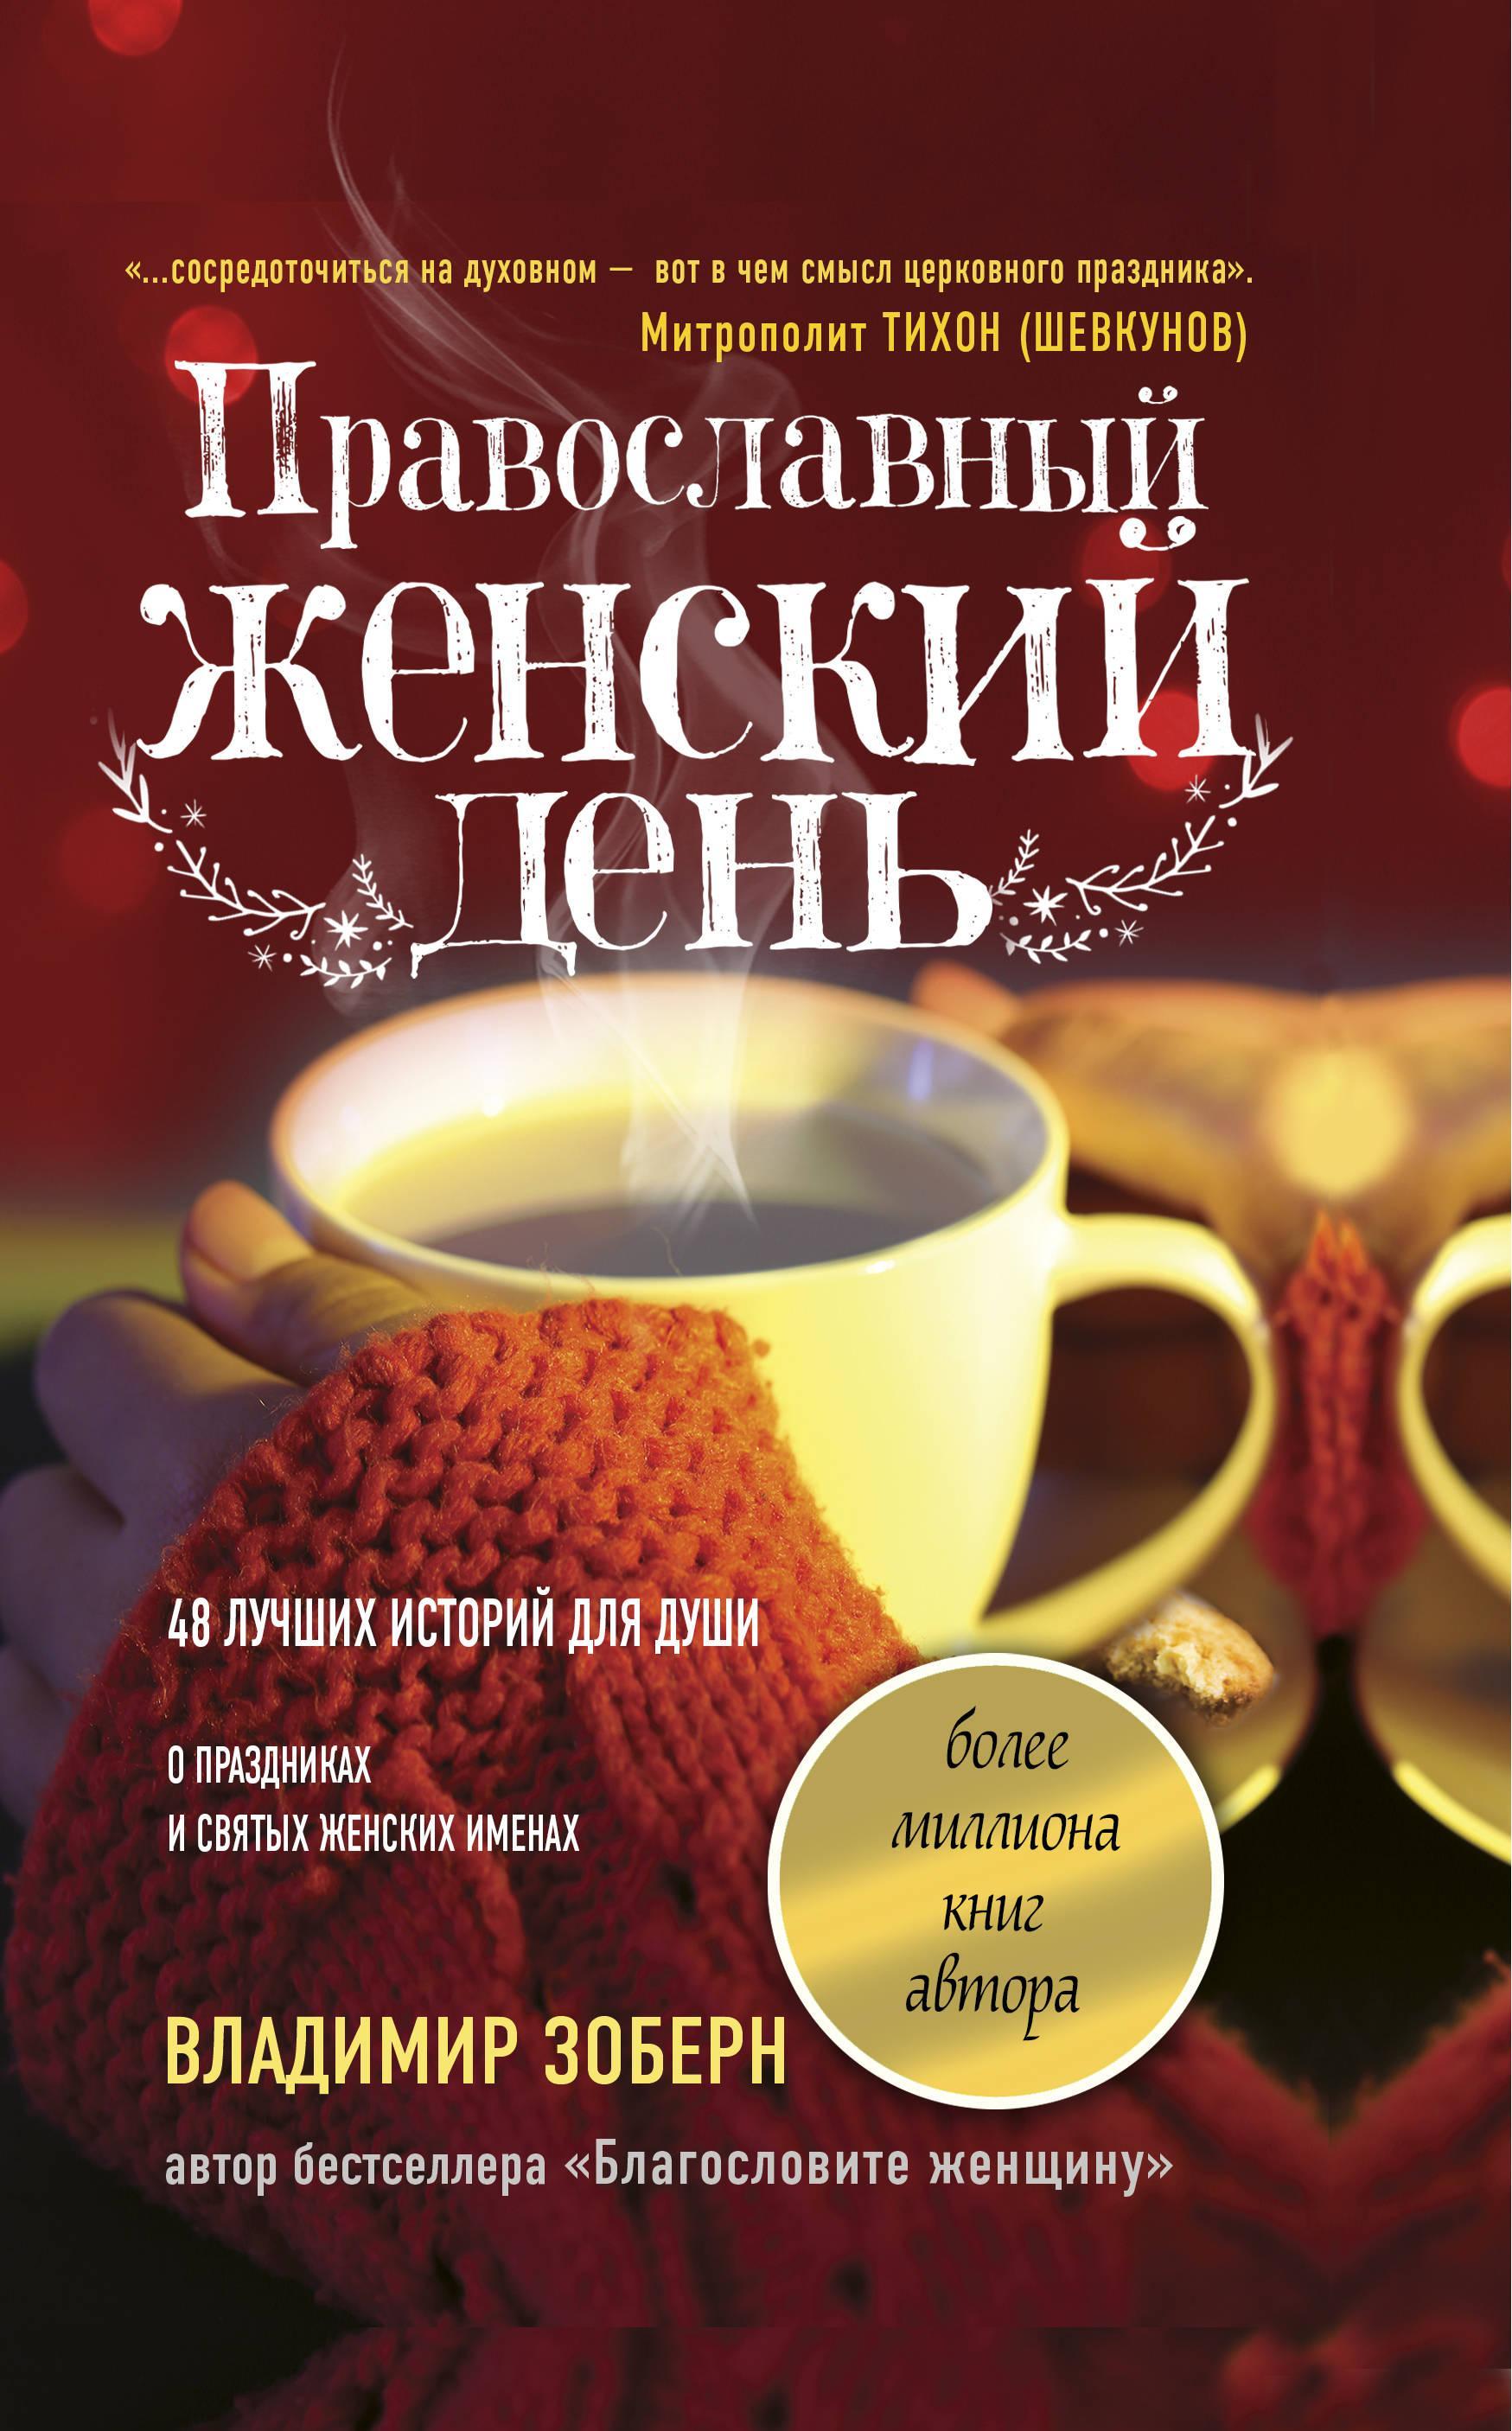 Pravoslavnyj zhenskij den